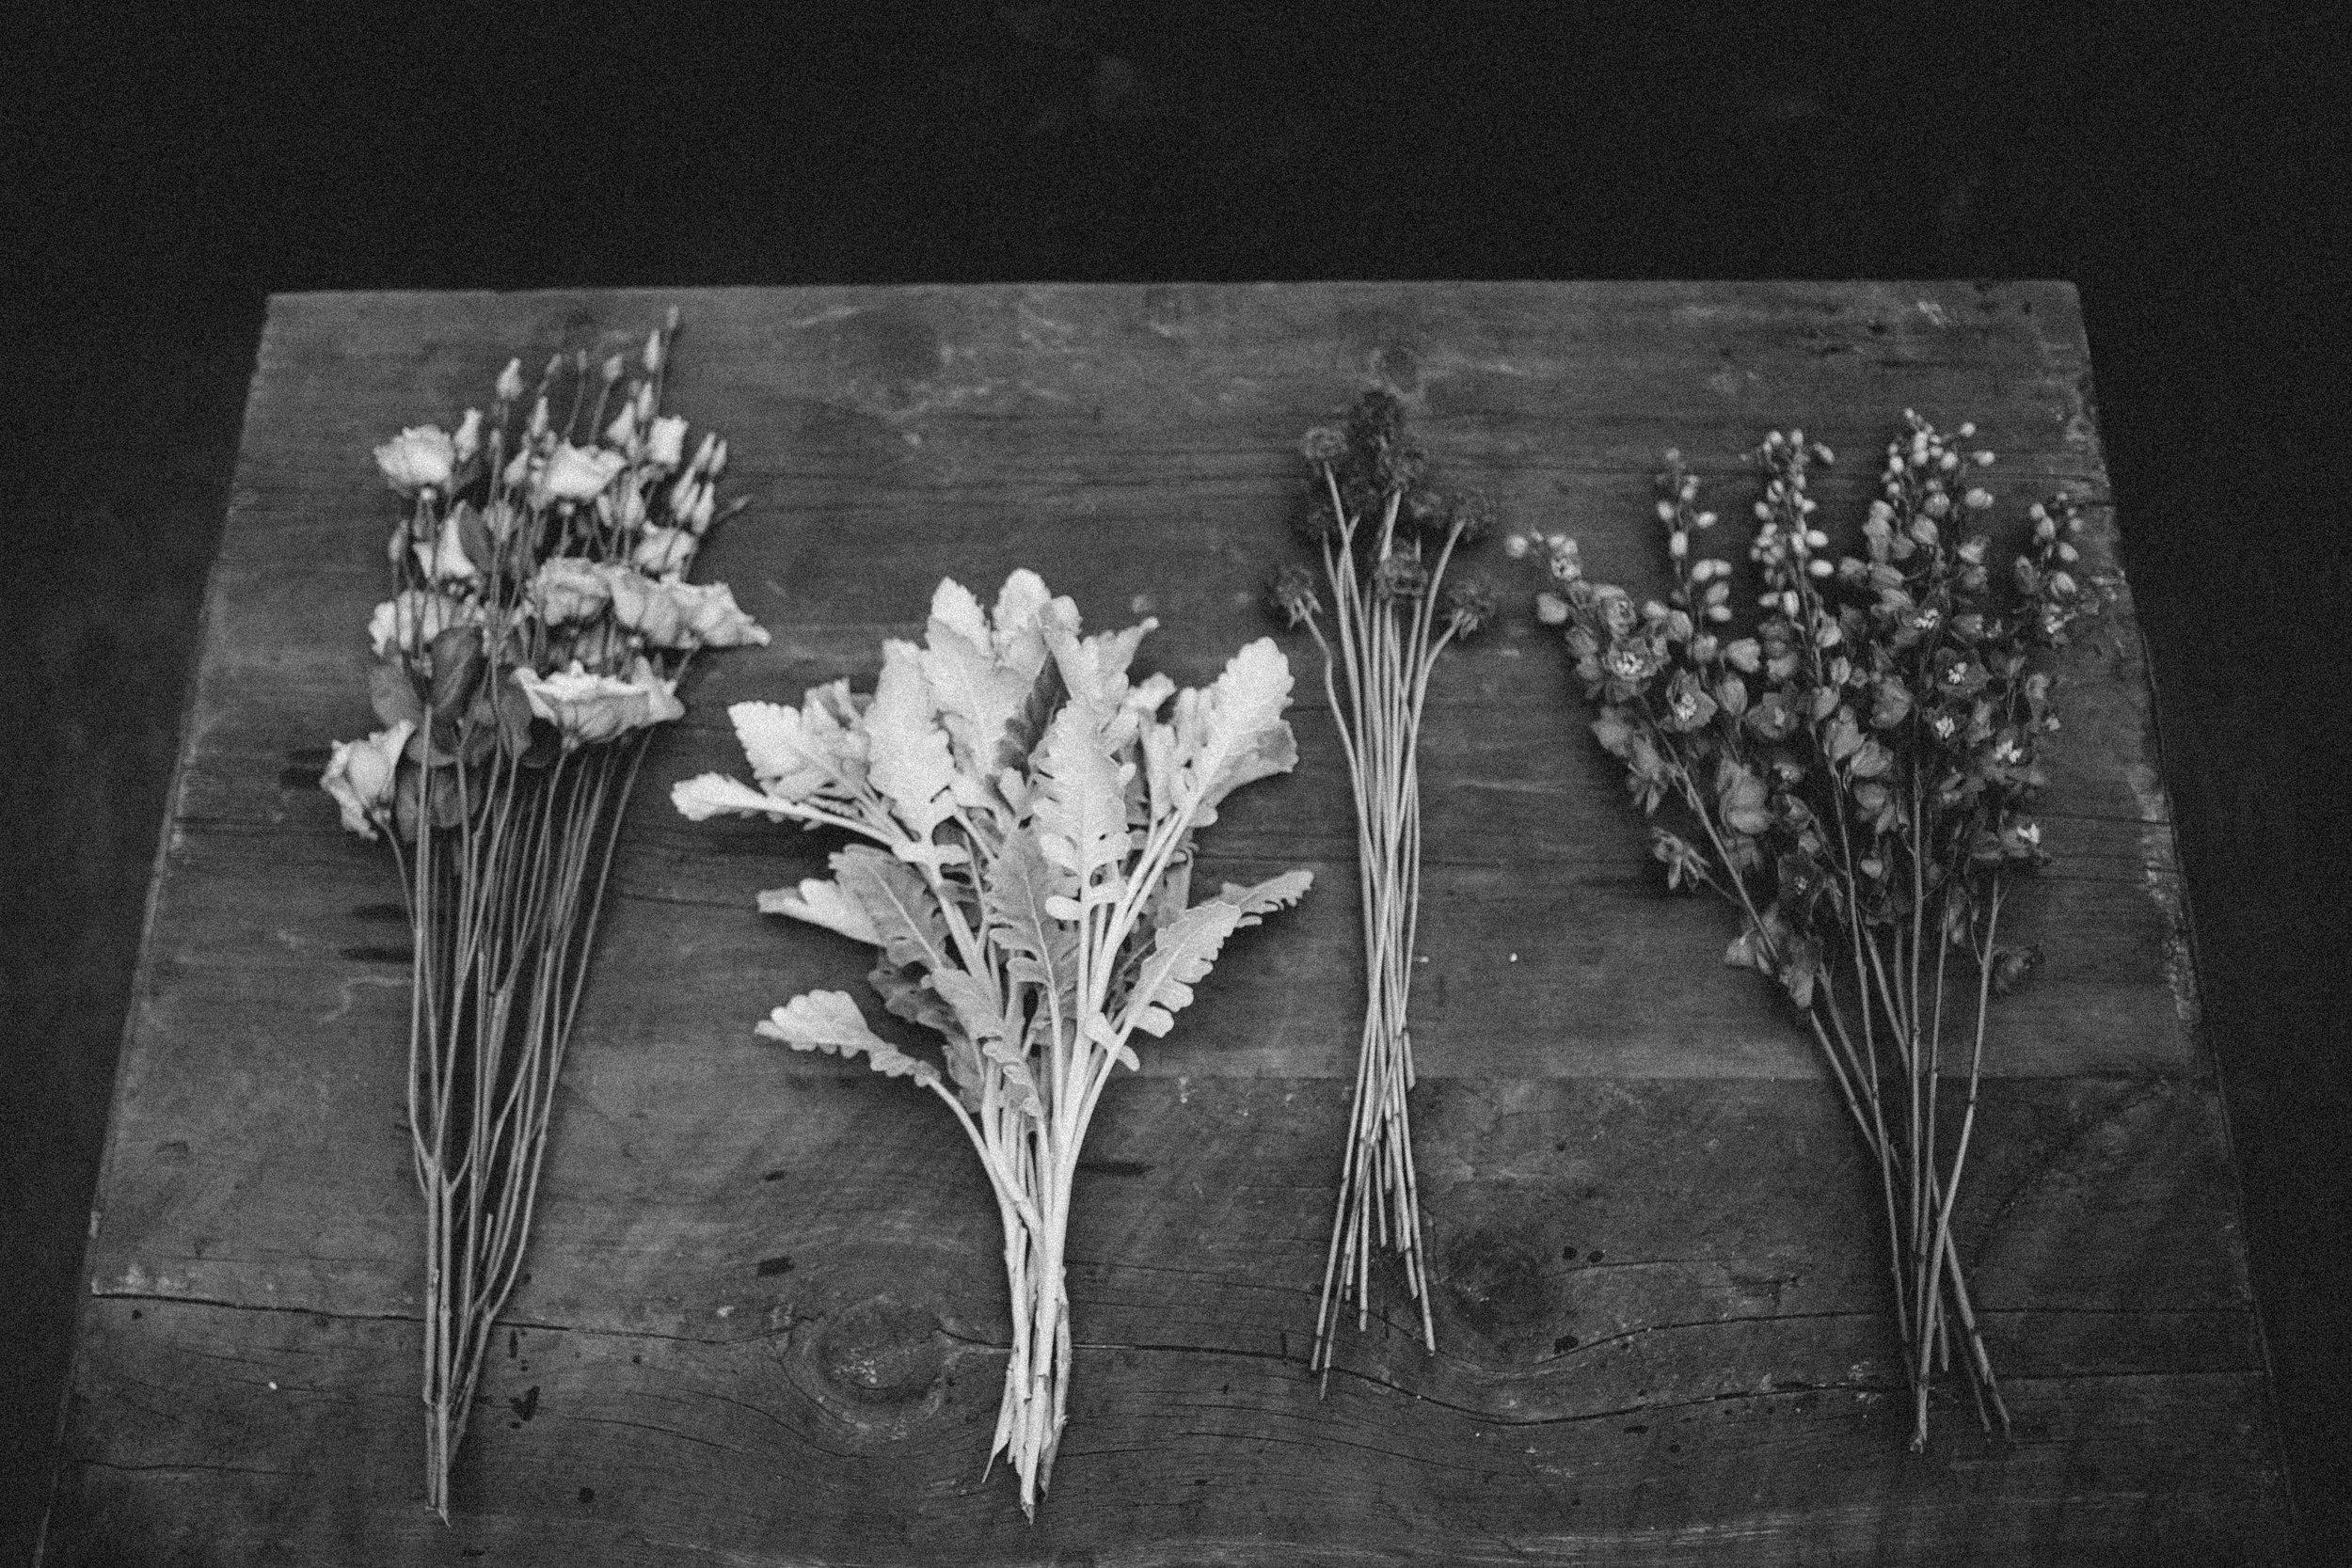 plantshed-9756.jpg